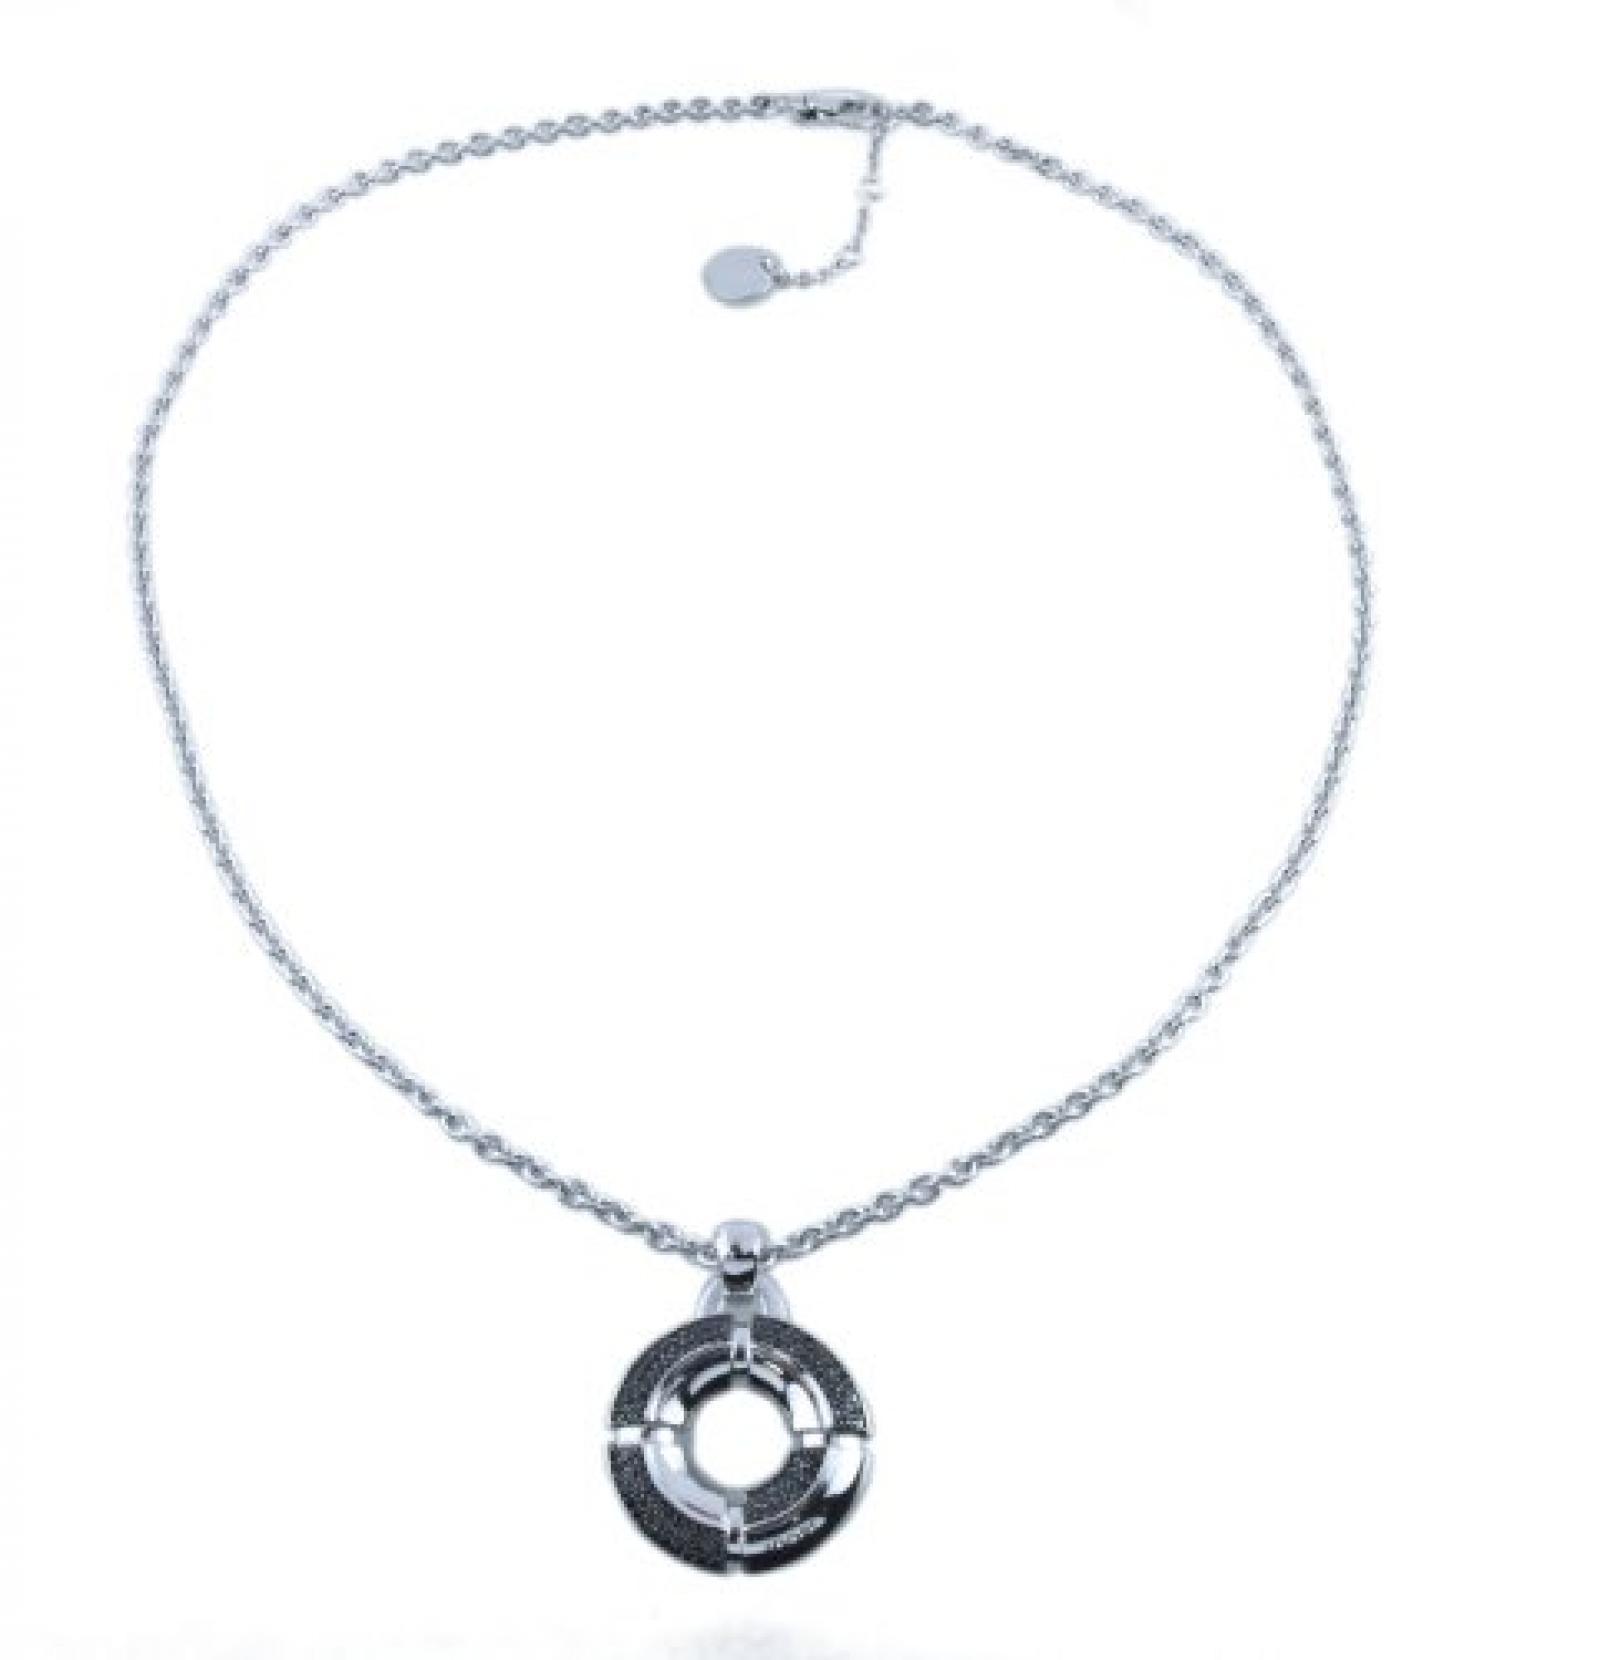 Joop! Damen-Halskette 925 Silber JPNL90331A450